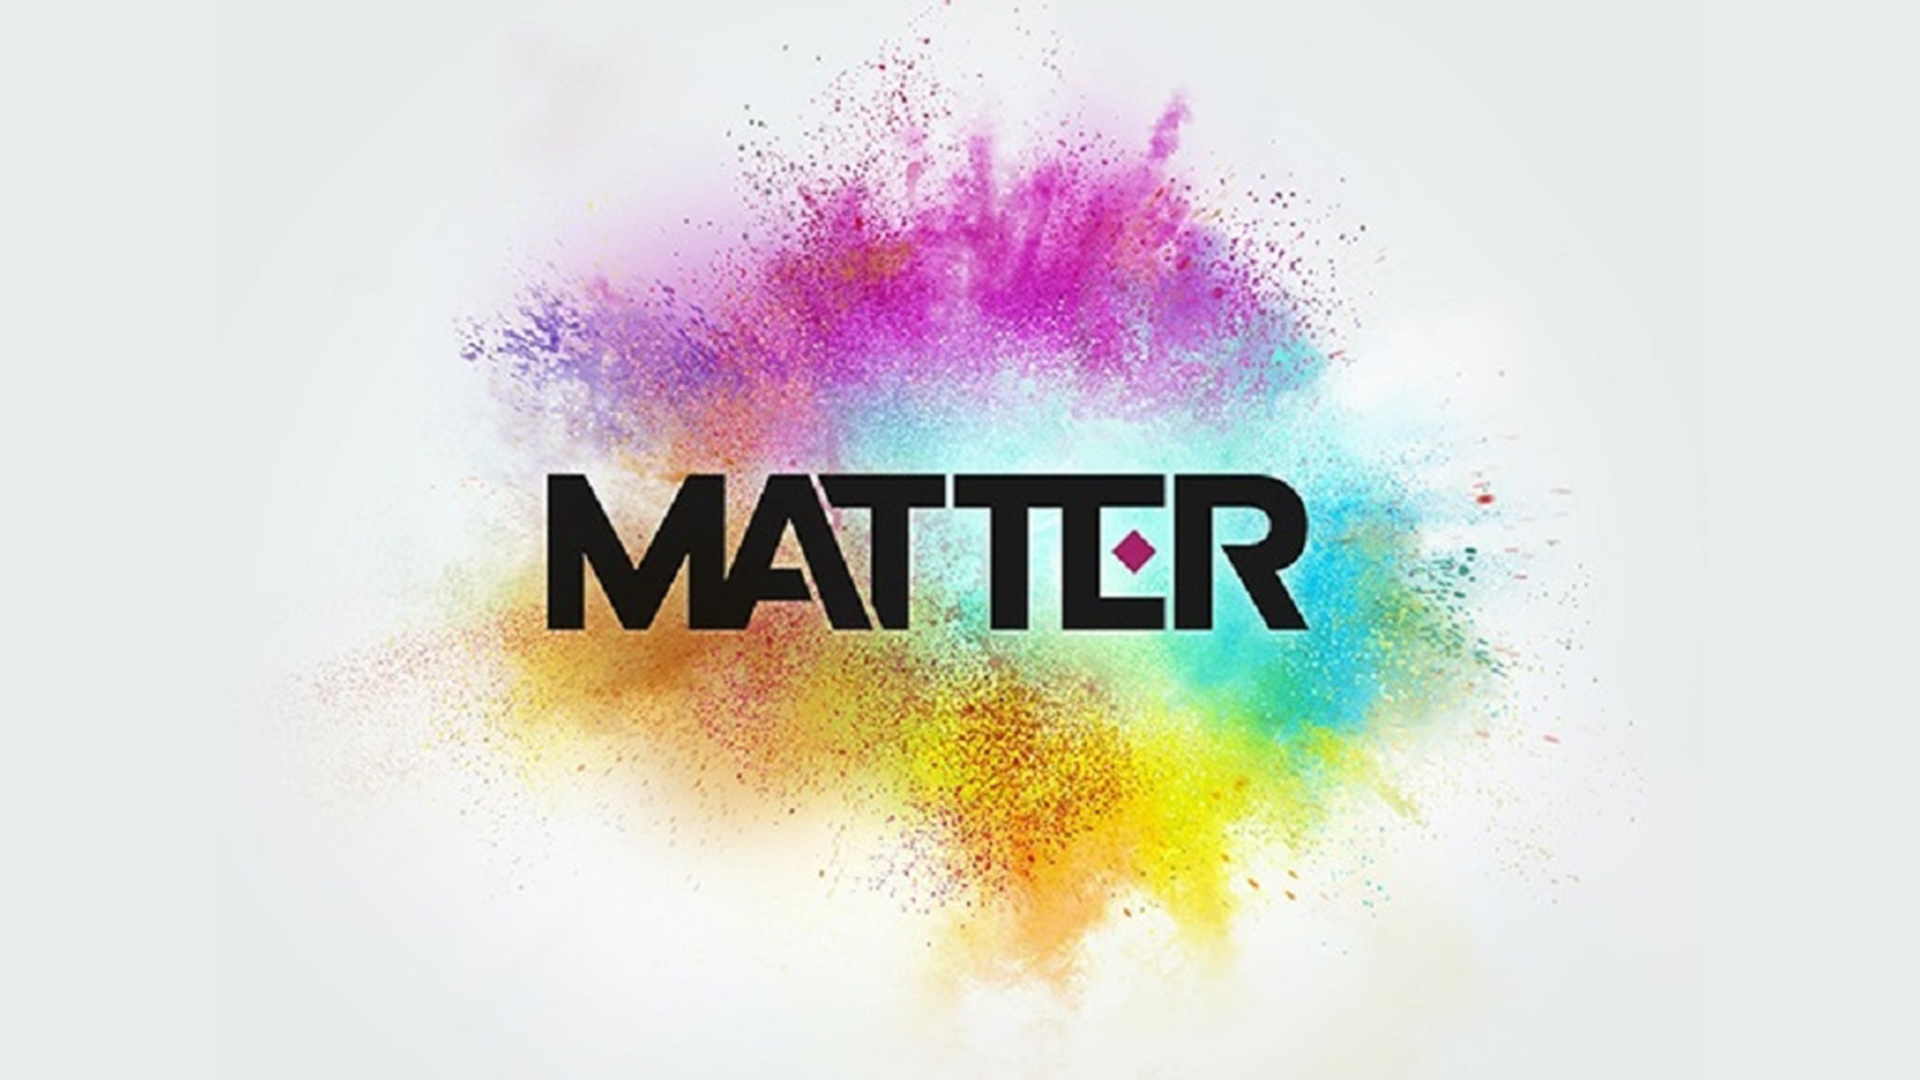 'Matter' trademark points to Bungie's next IP   PCGamesN